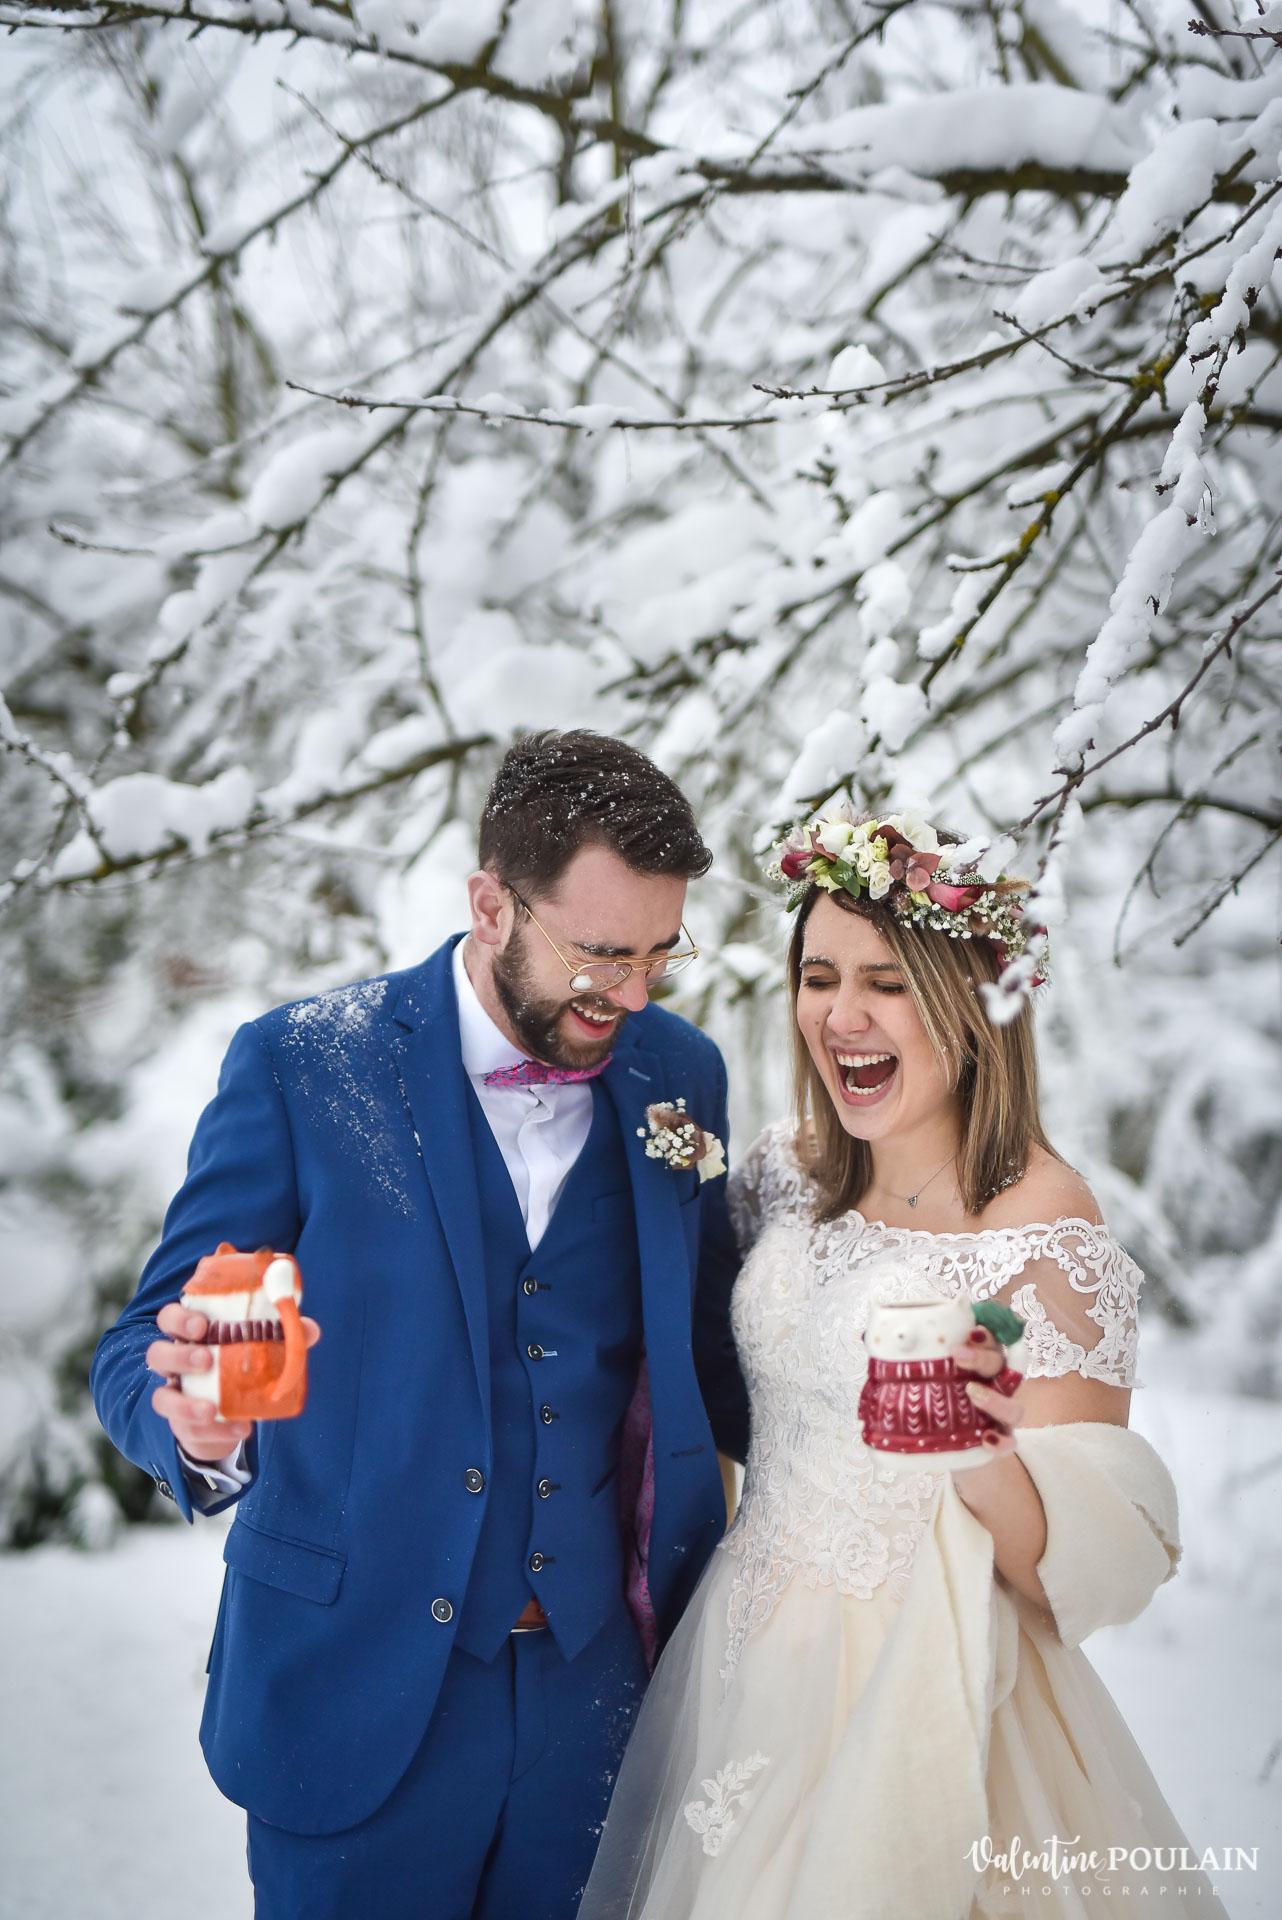 Photo mariage neige hiver - Valentine Poulain fou-rire